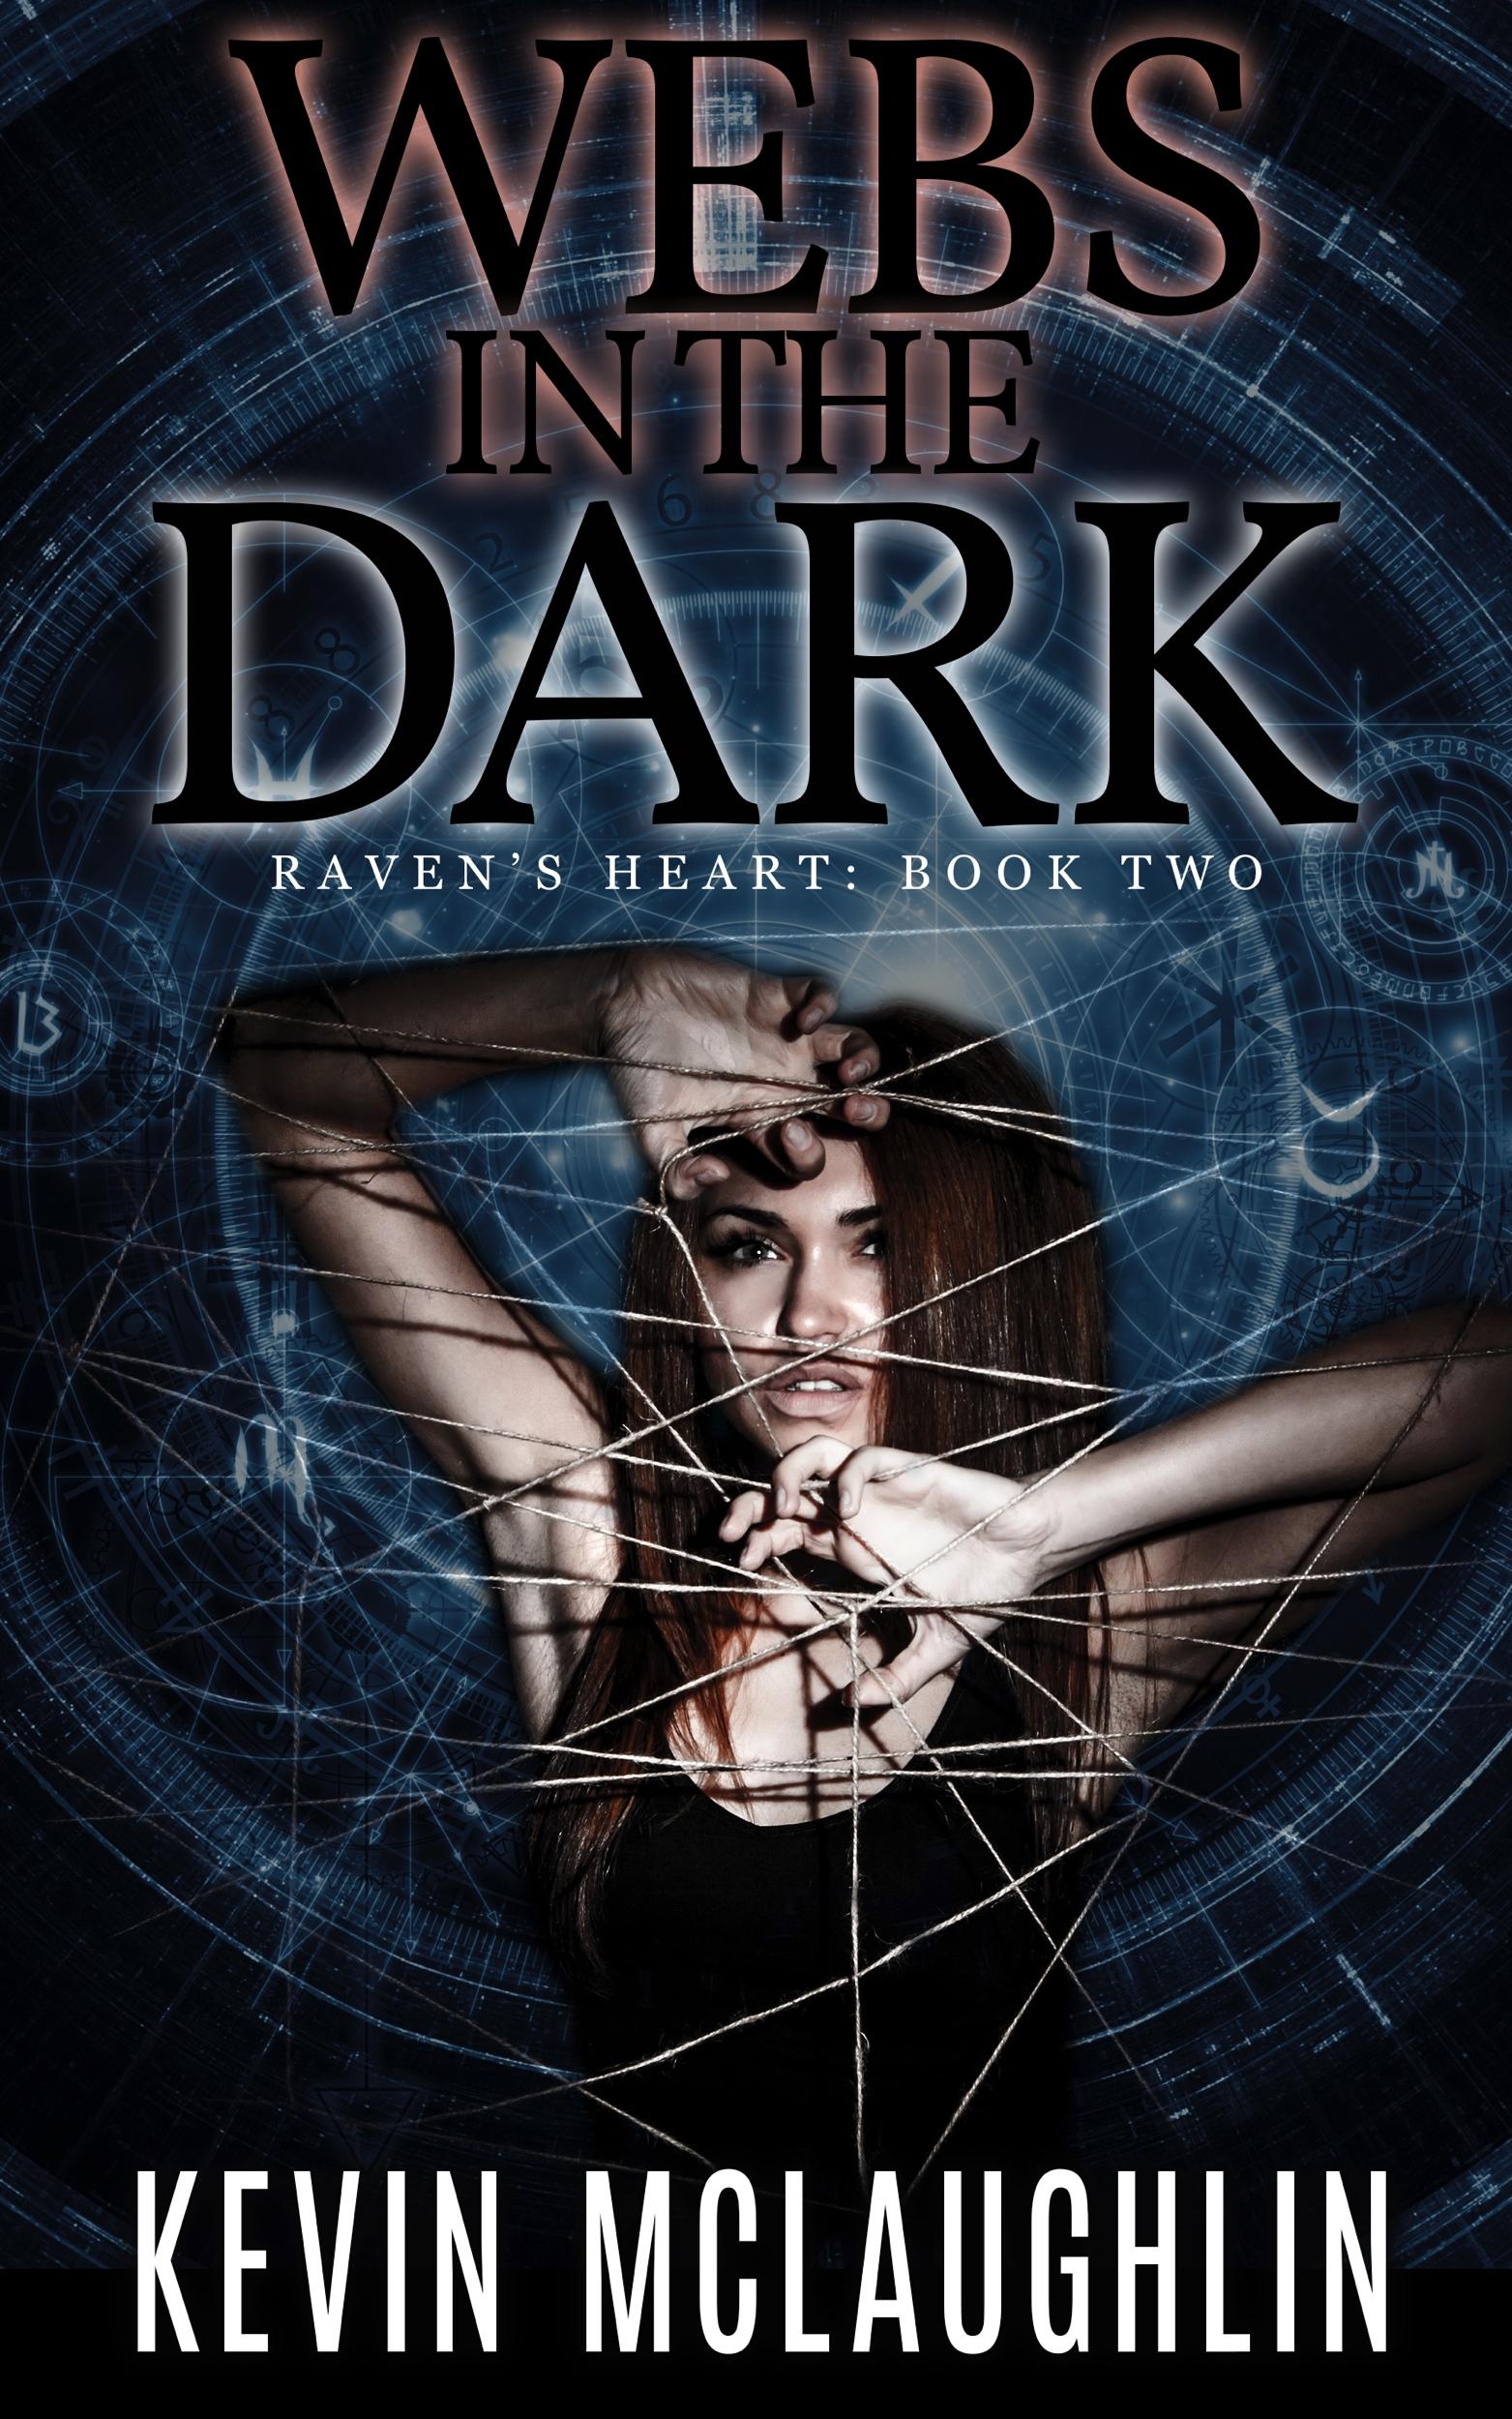 Webs-in-the-Dark-Kindle